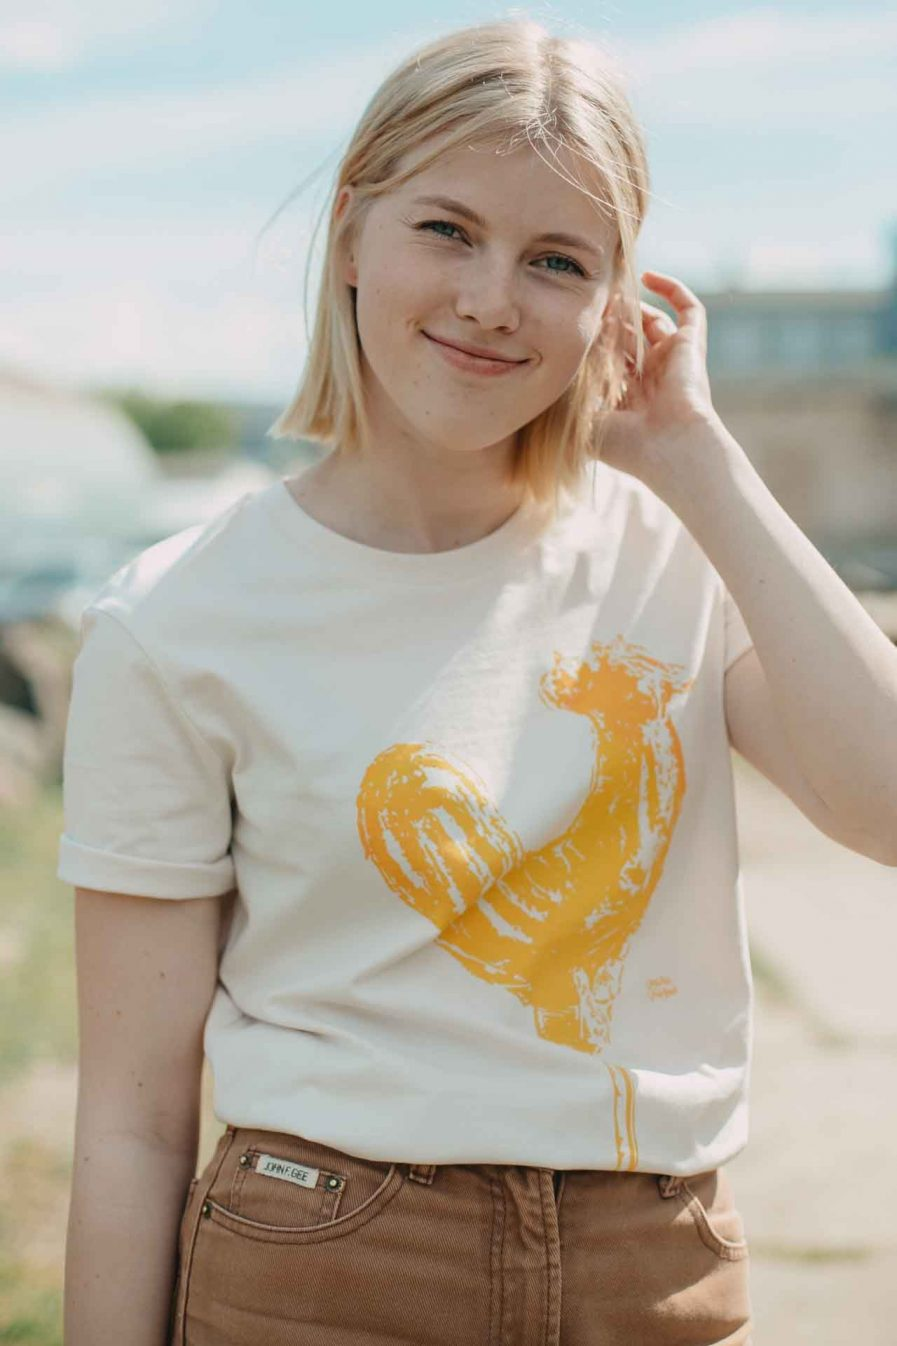 Vaira Vīksne Unisex Organic Cotton T-shirt BURNT SUGAR lollipop - Vintage white